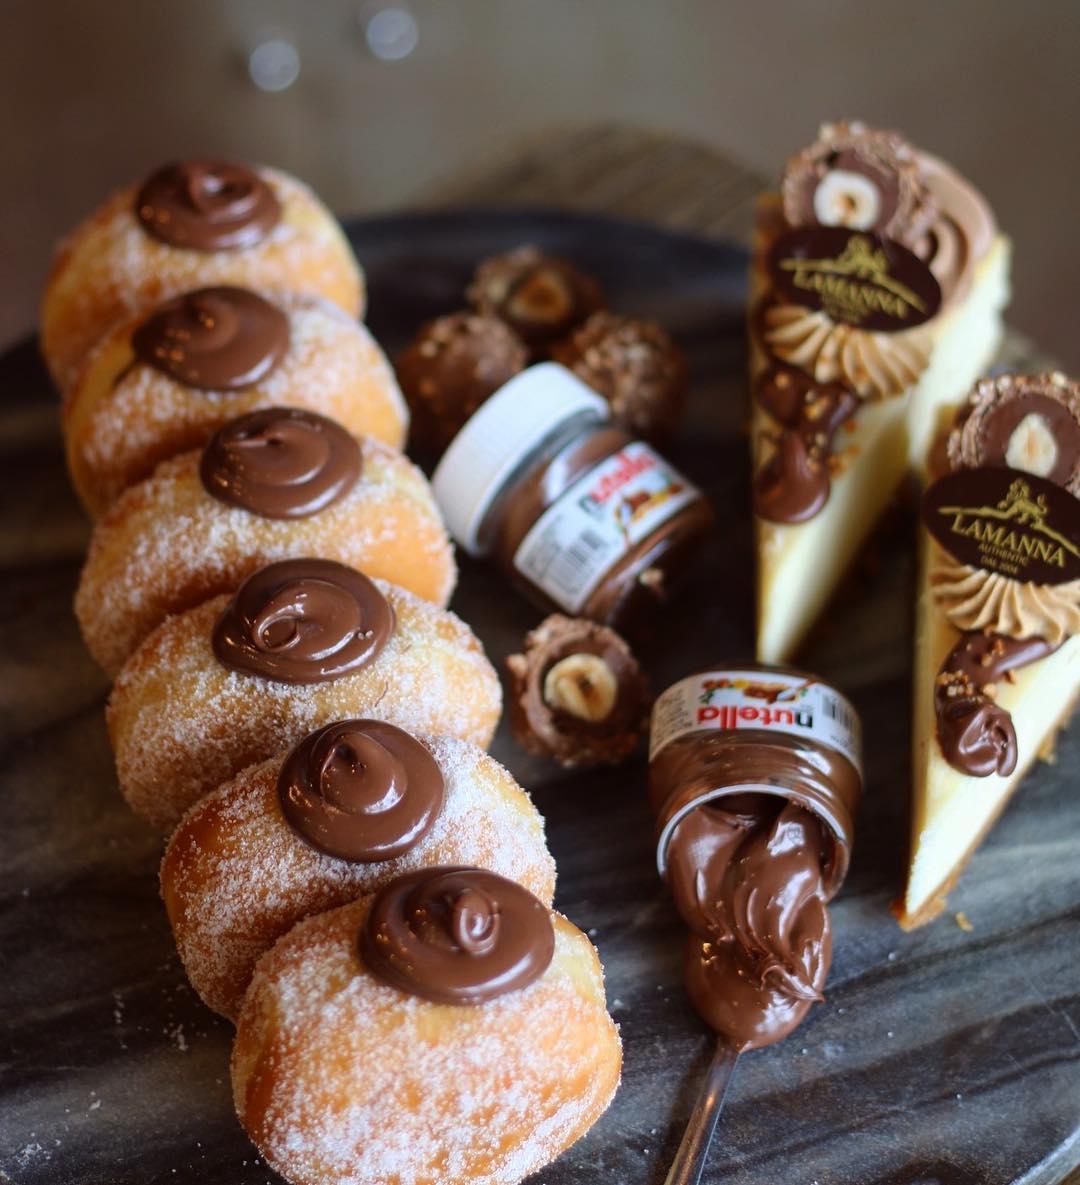 lamanna's world nutella day toronto food events